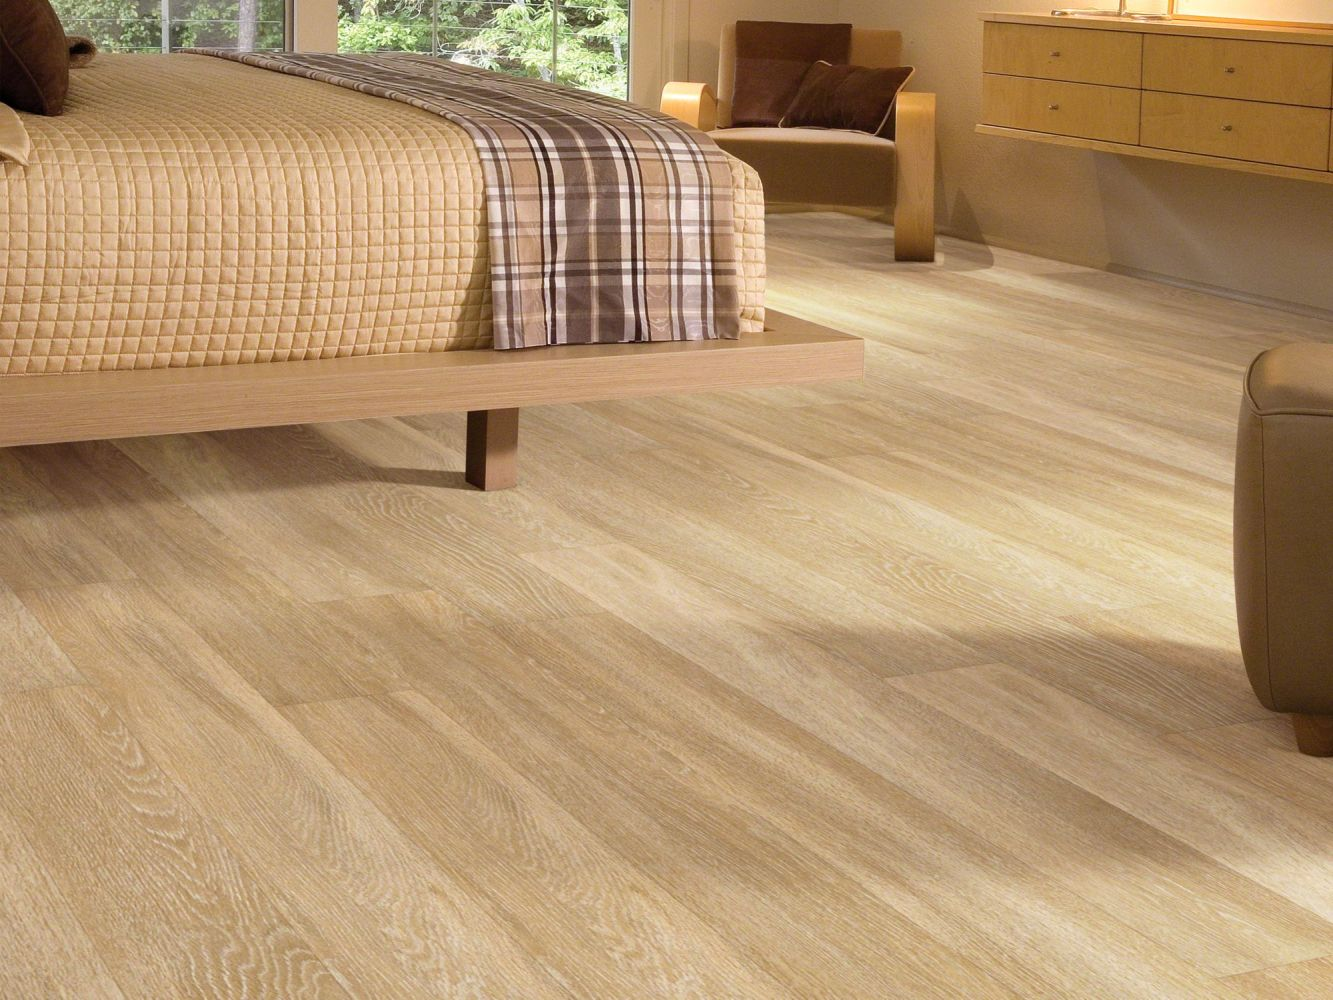 Shaw Floors Exclusive Pacific Coast12 Paris 00343_1029V